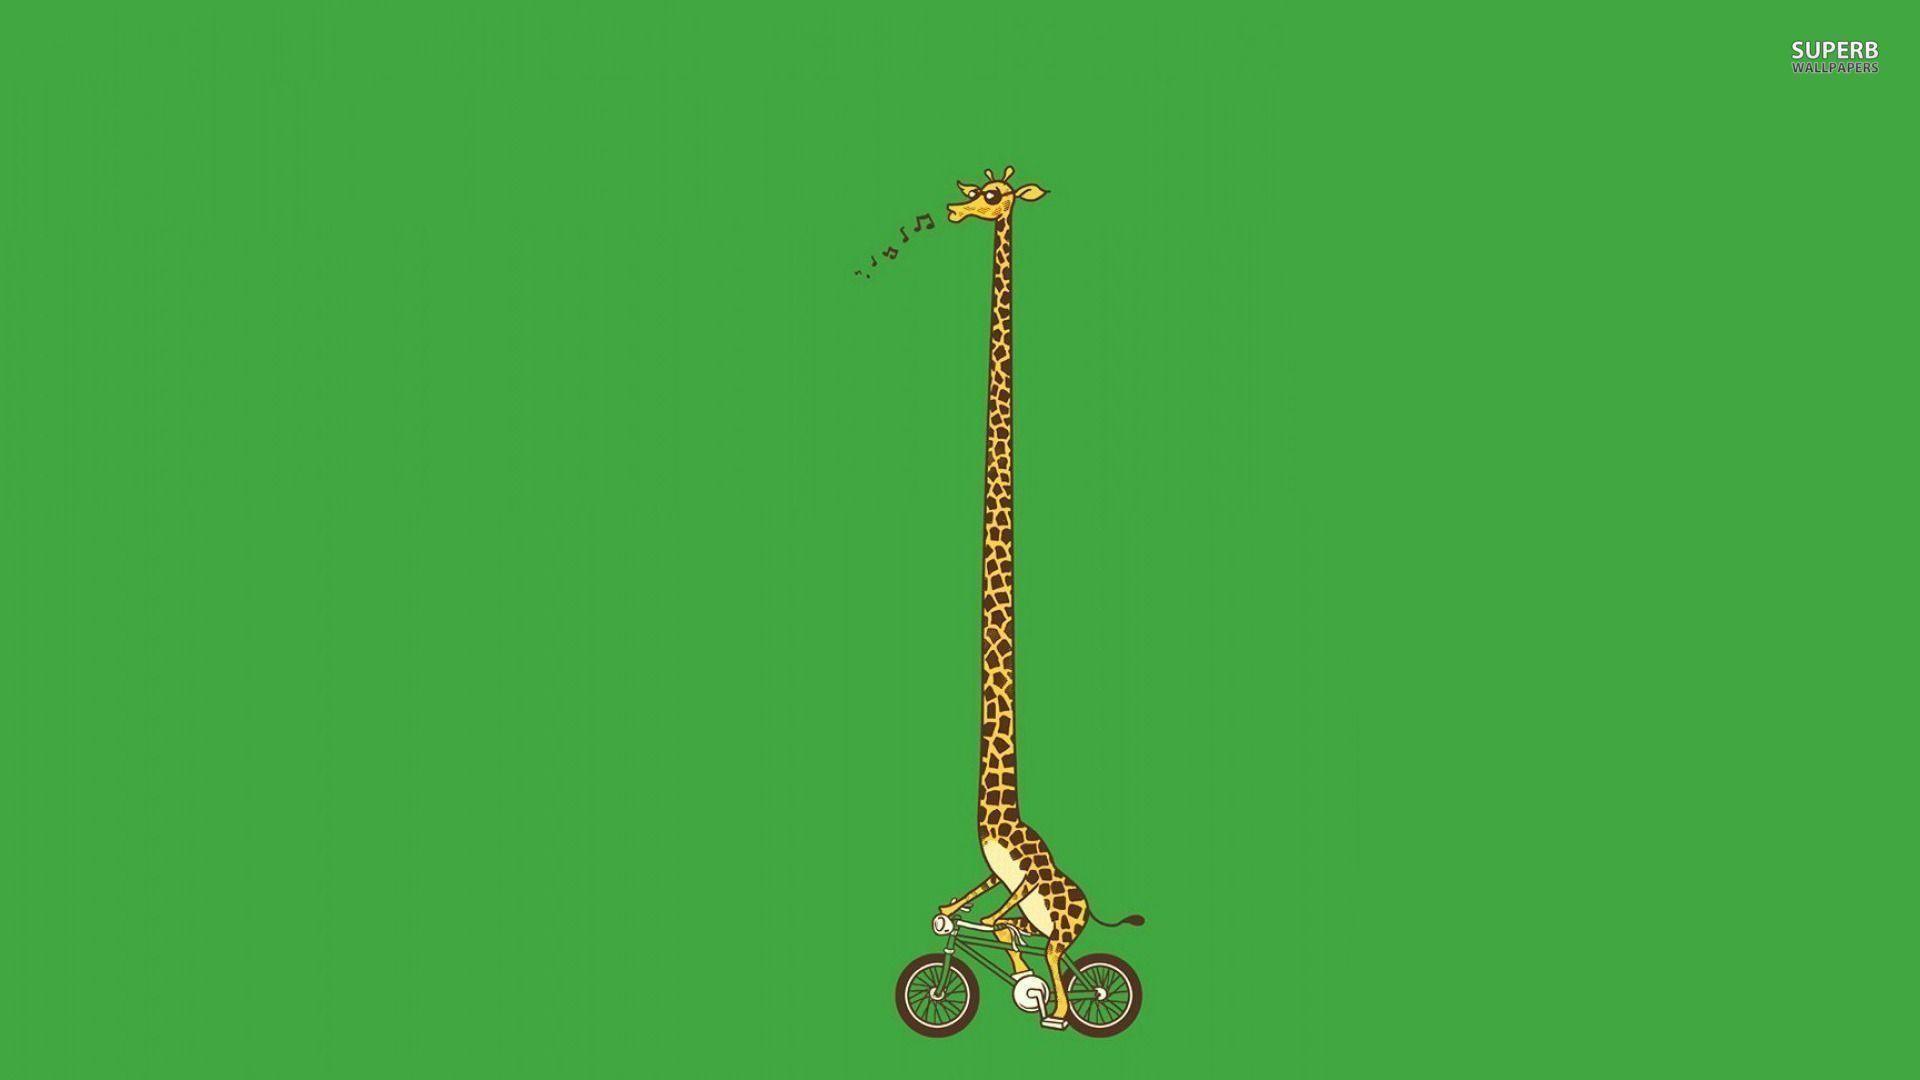 Biking giraffe wallpaper – Funny wallpapers – #